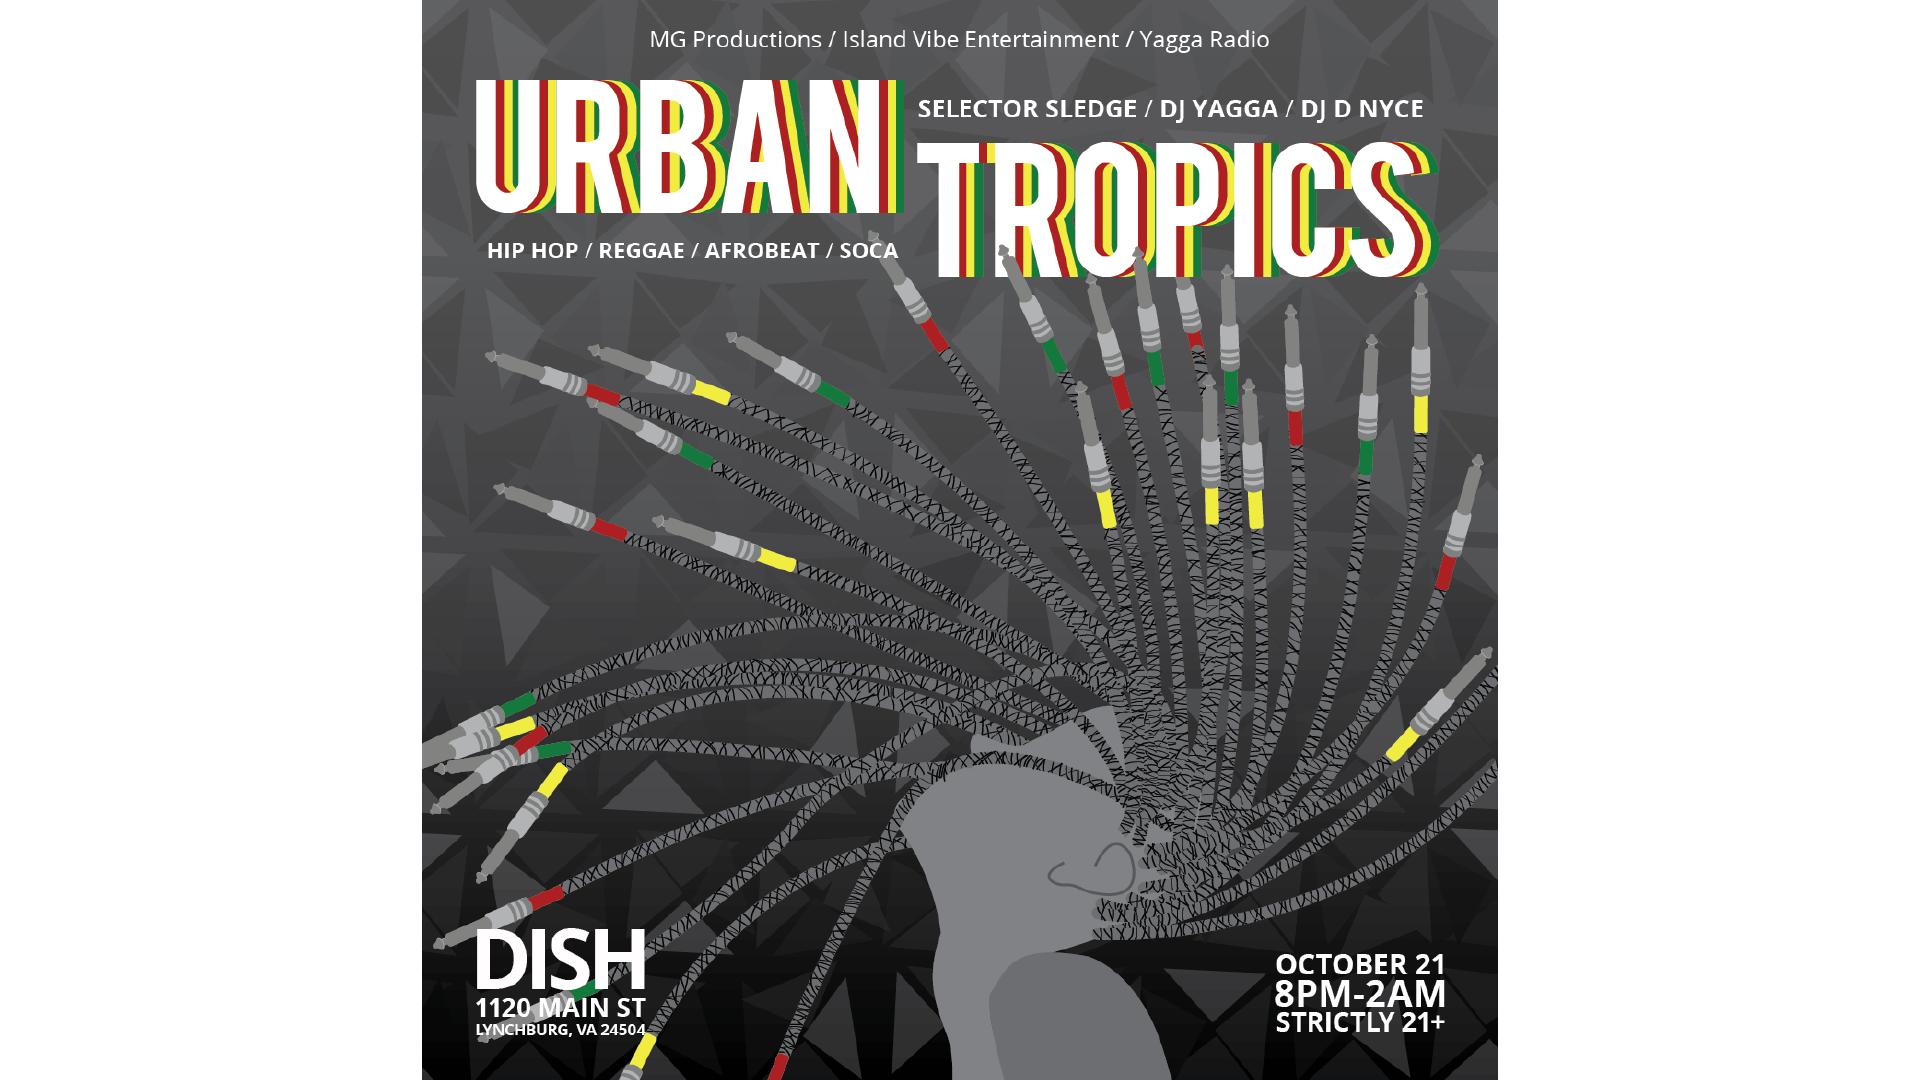 UrbanTropics_Slide1.png